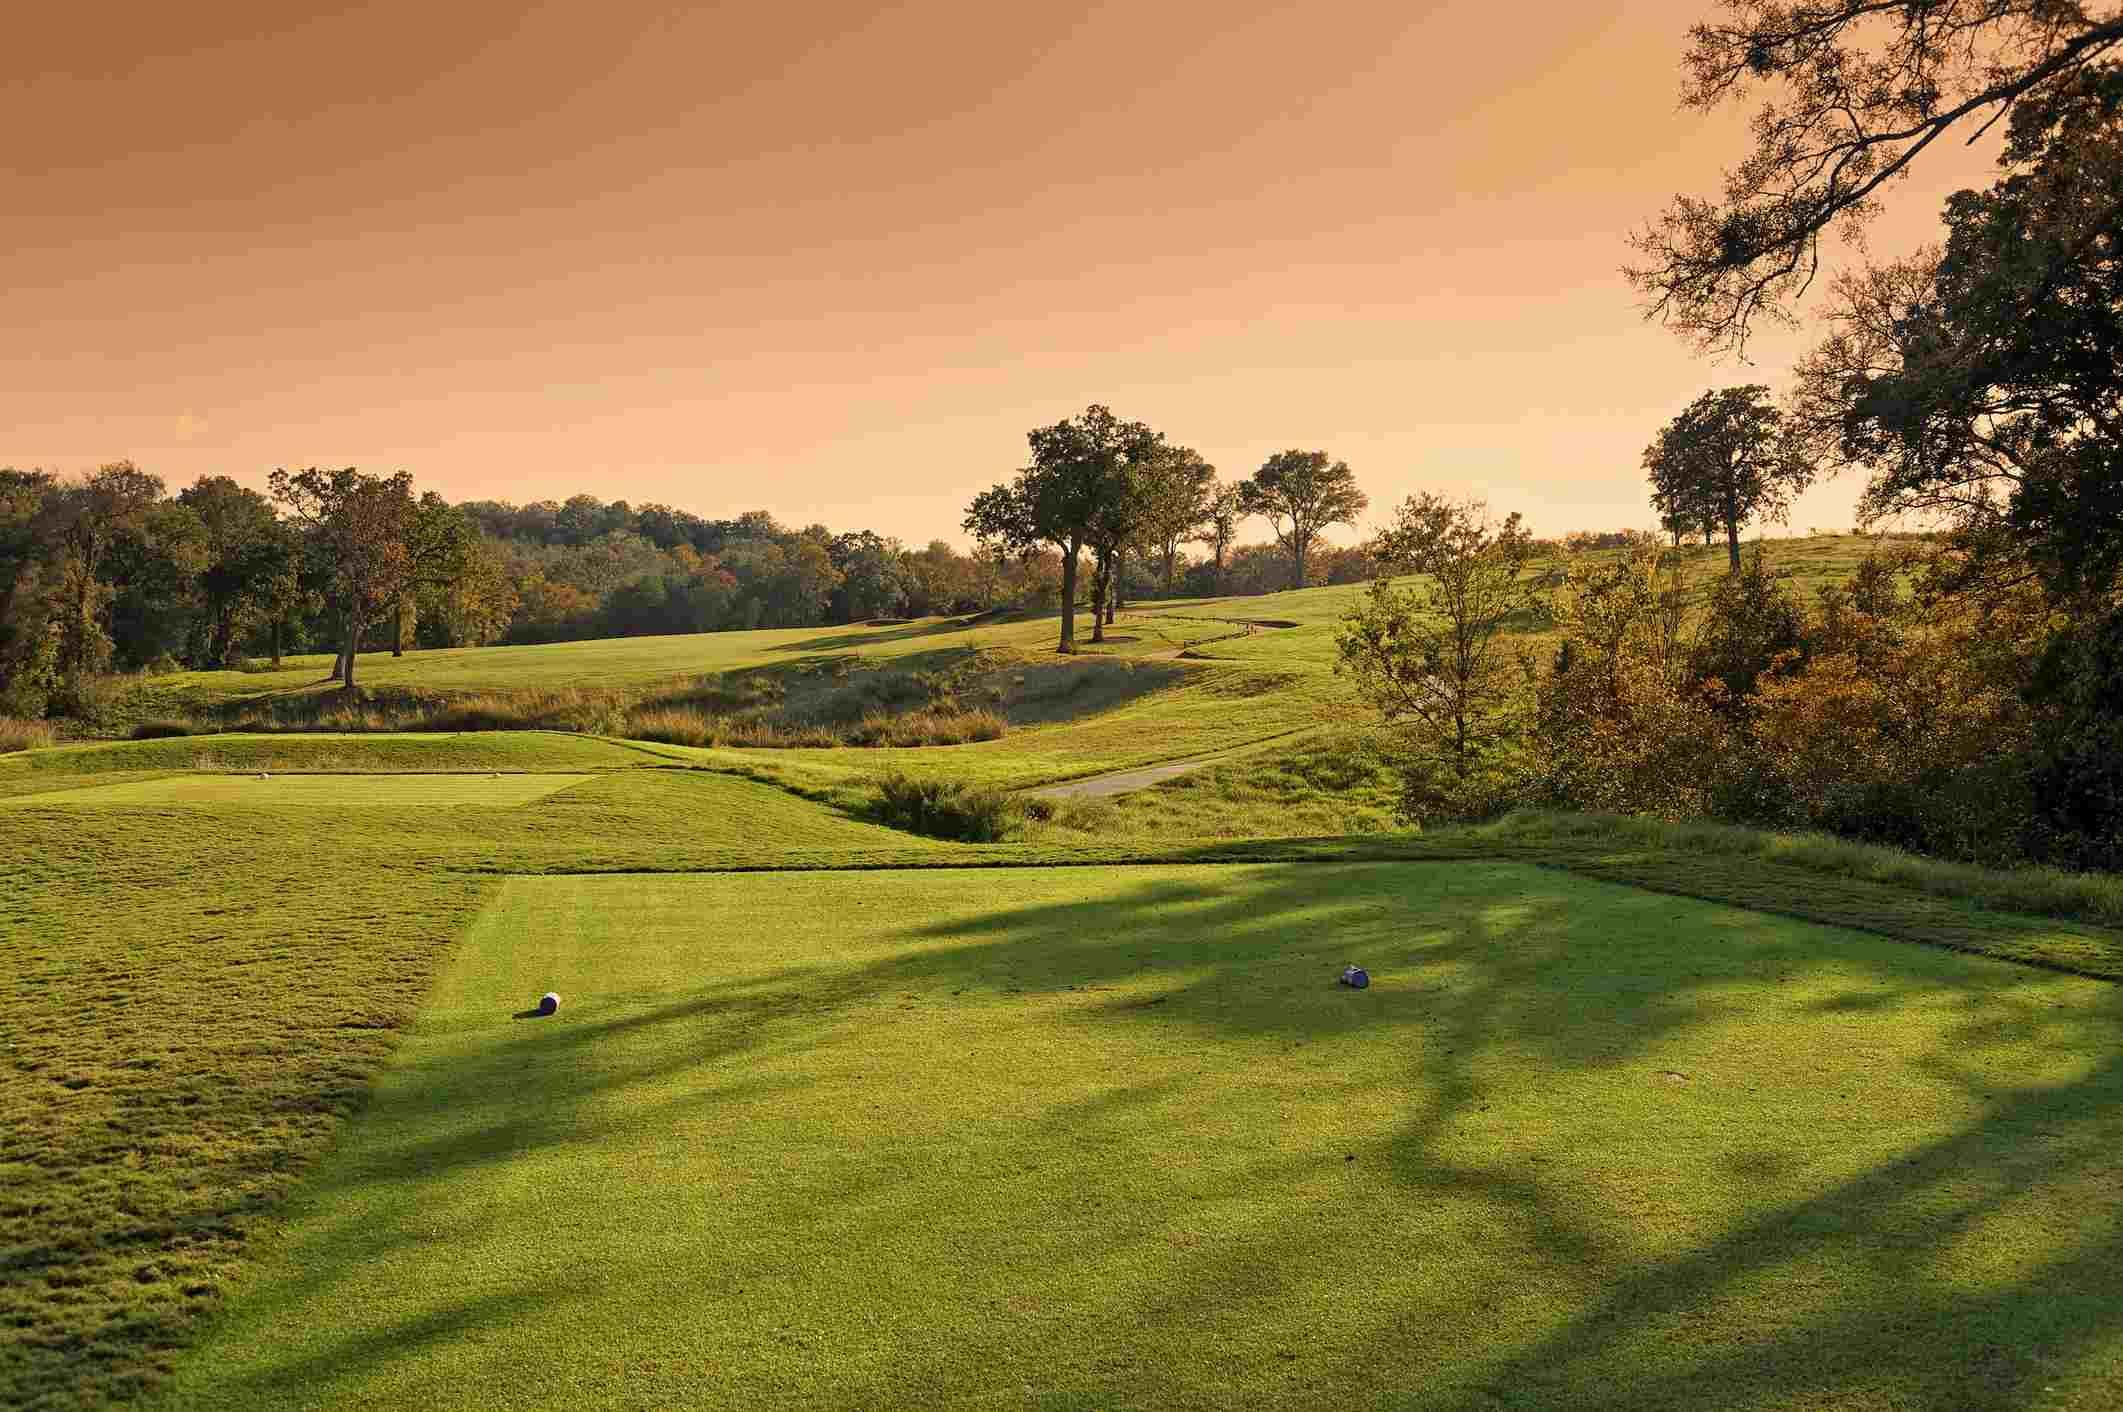 Golf course in Austin, Texas